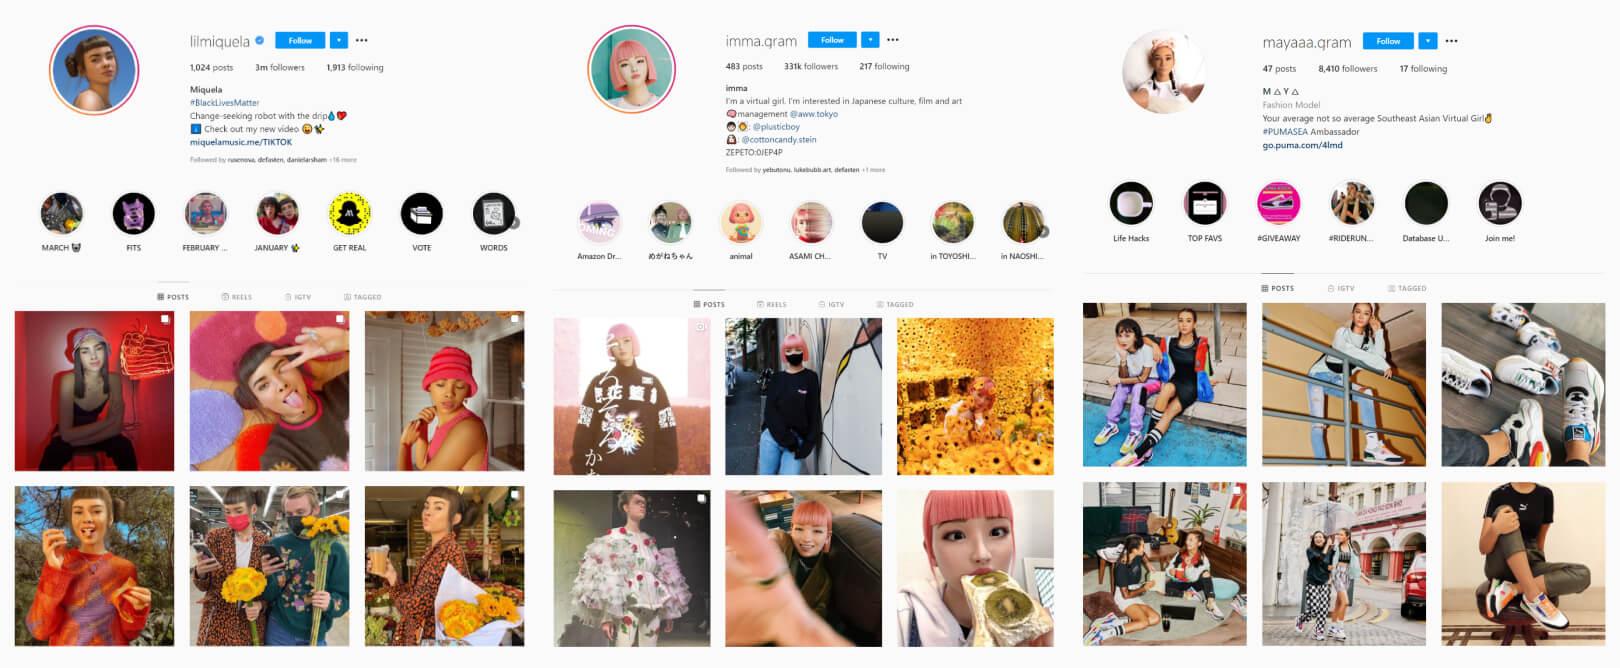 Instagram virtual profiles